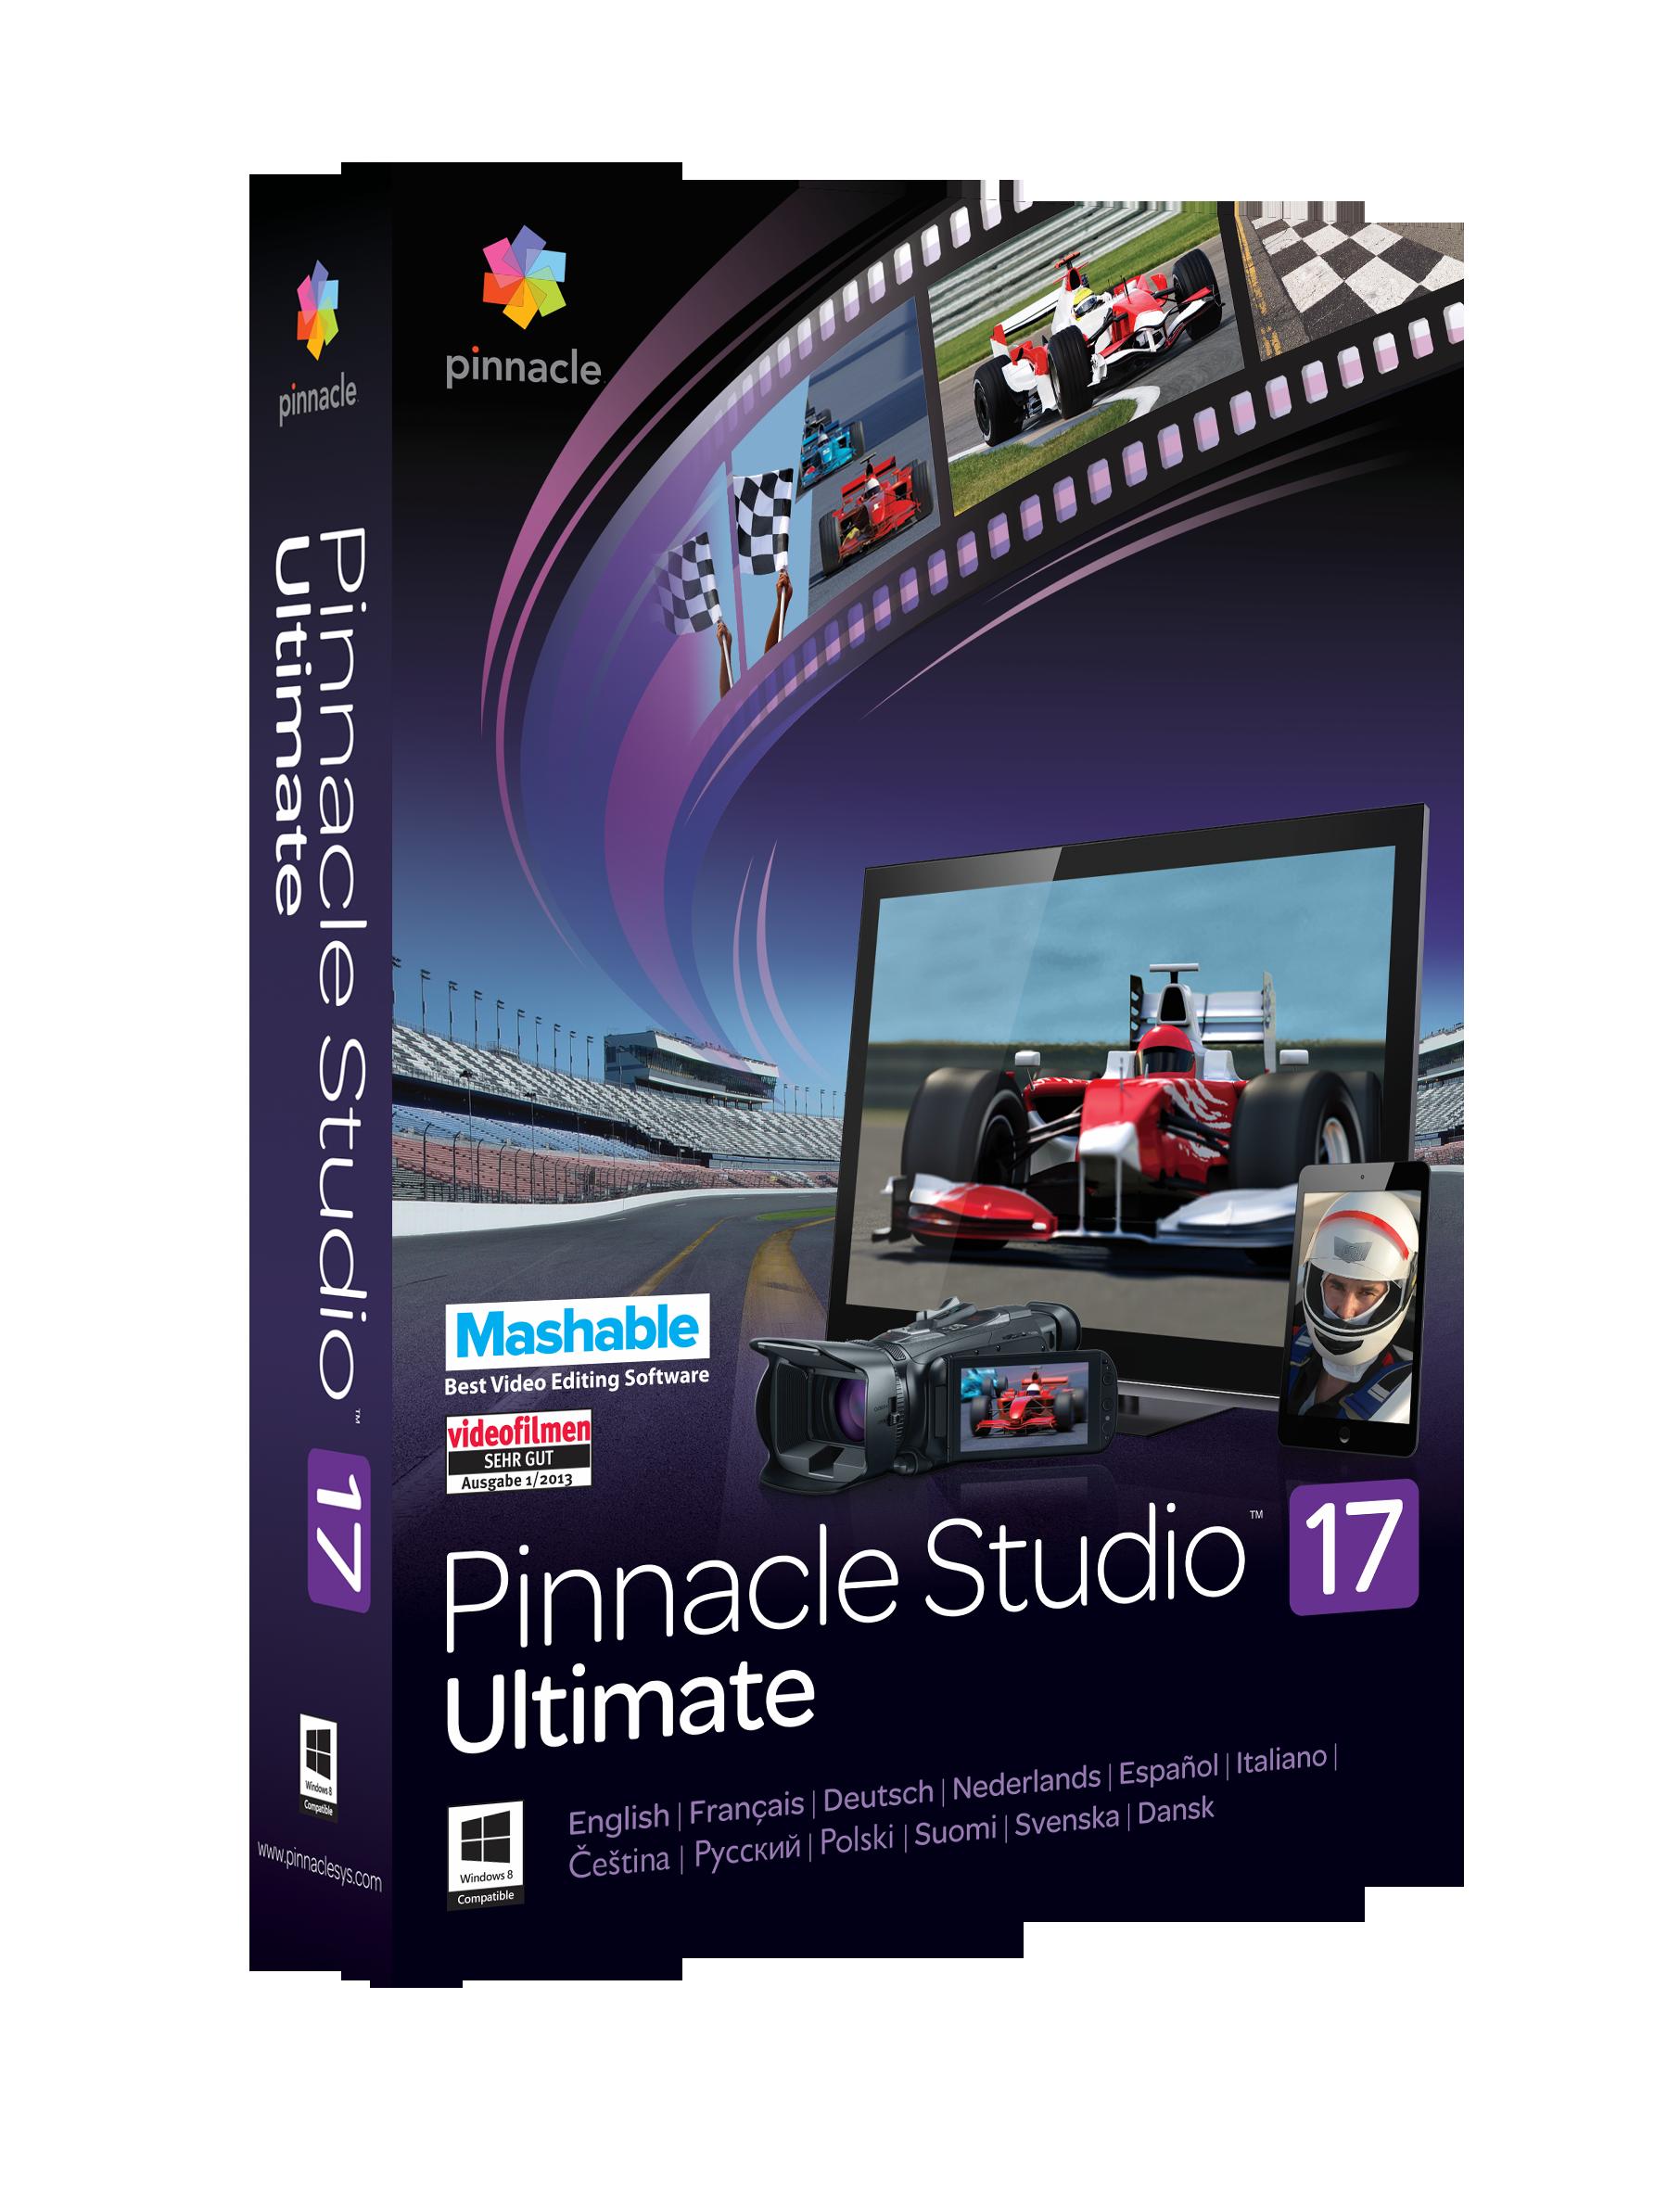 pinnacle studio 17 ultimate serial key